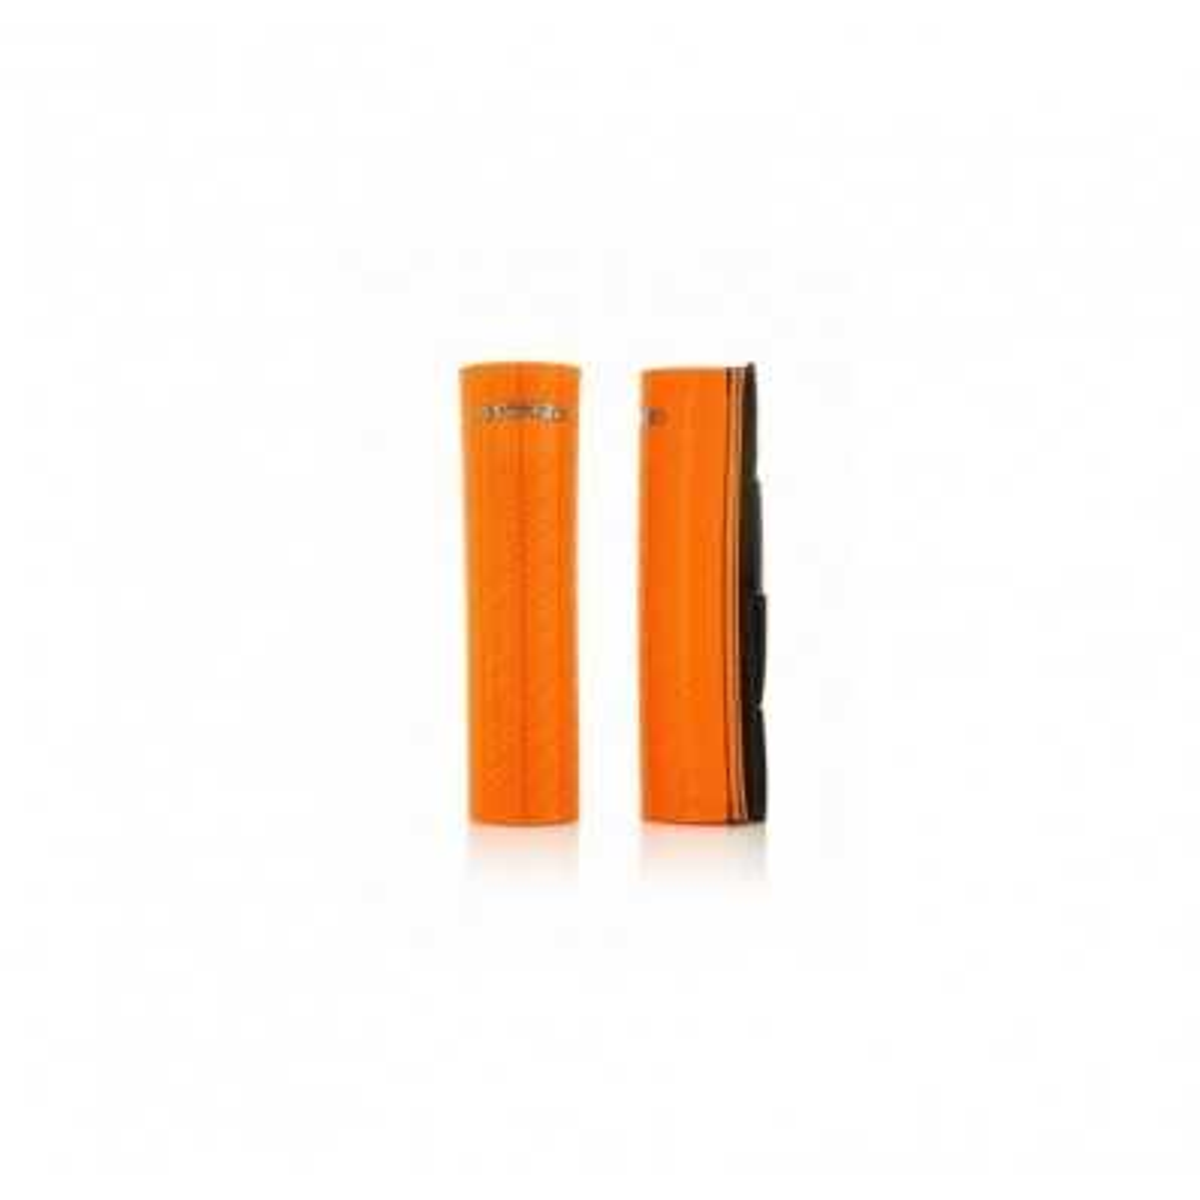 0021750-010 - Protege Horquilla Acerbis Naranja